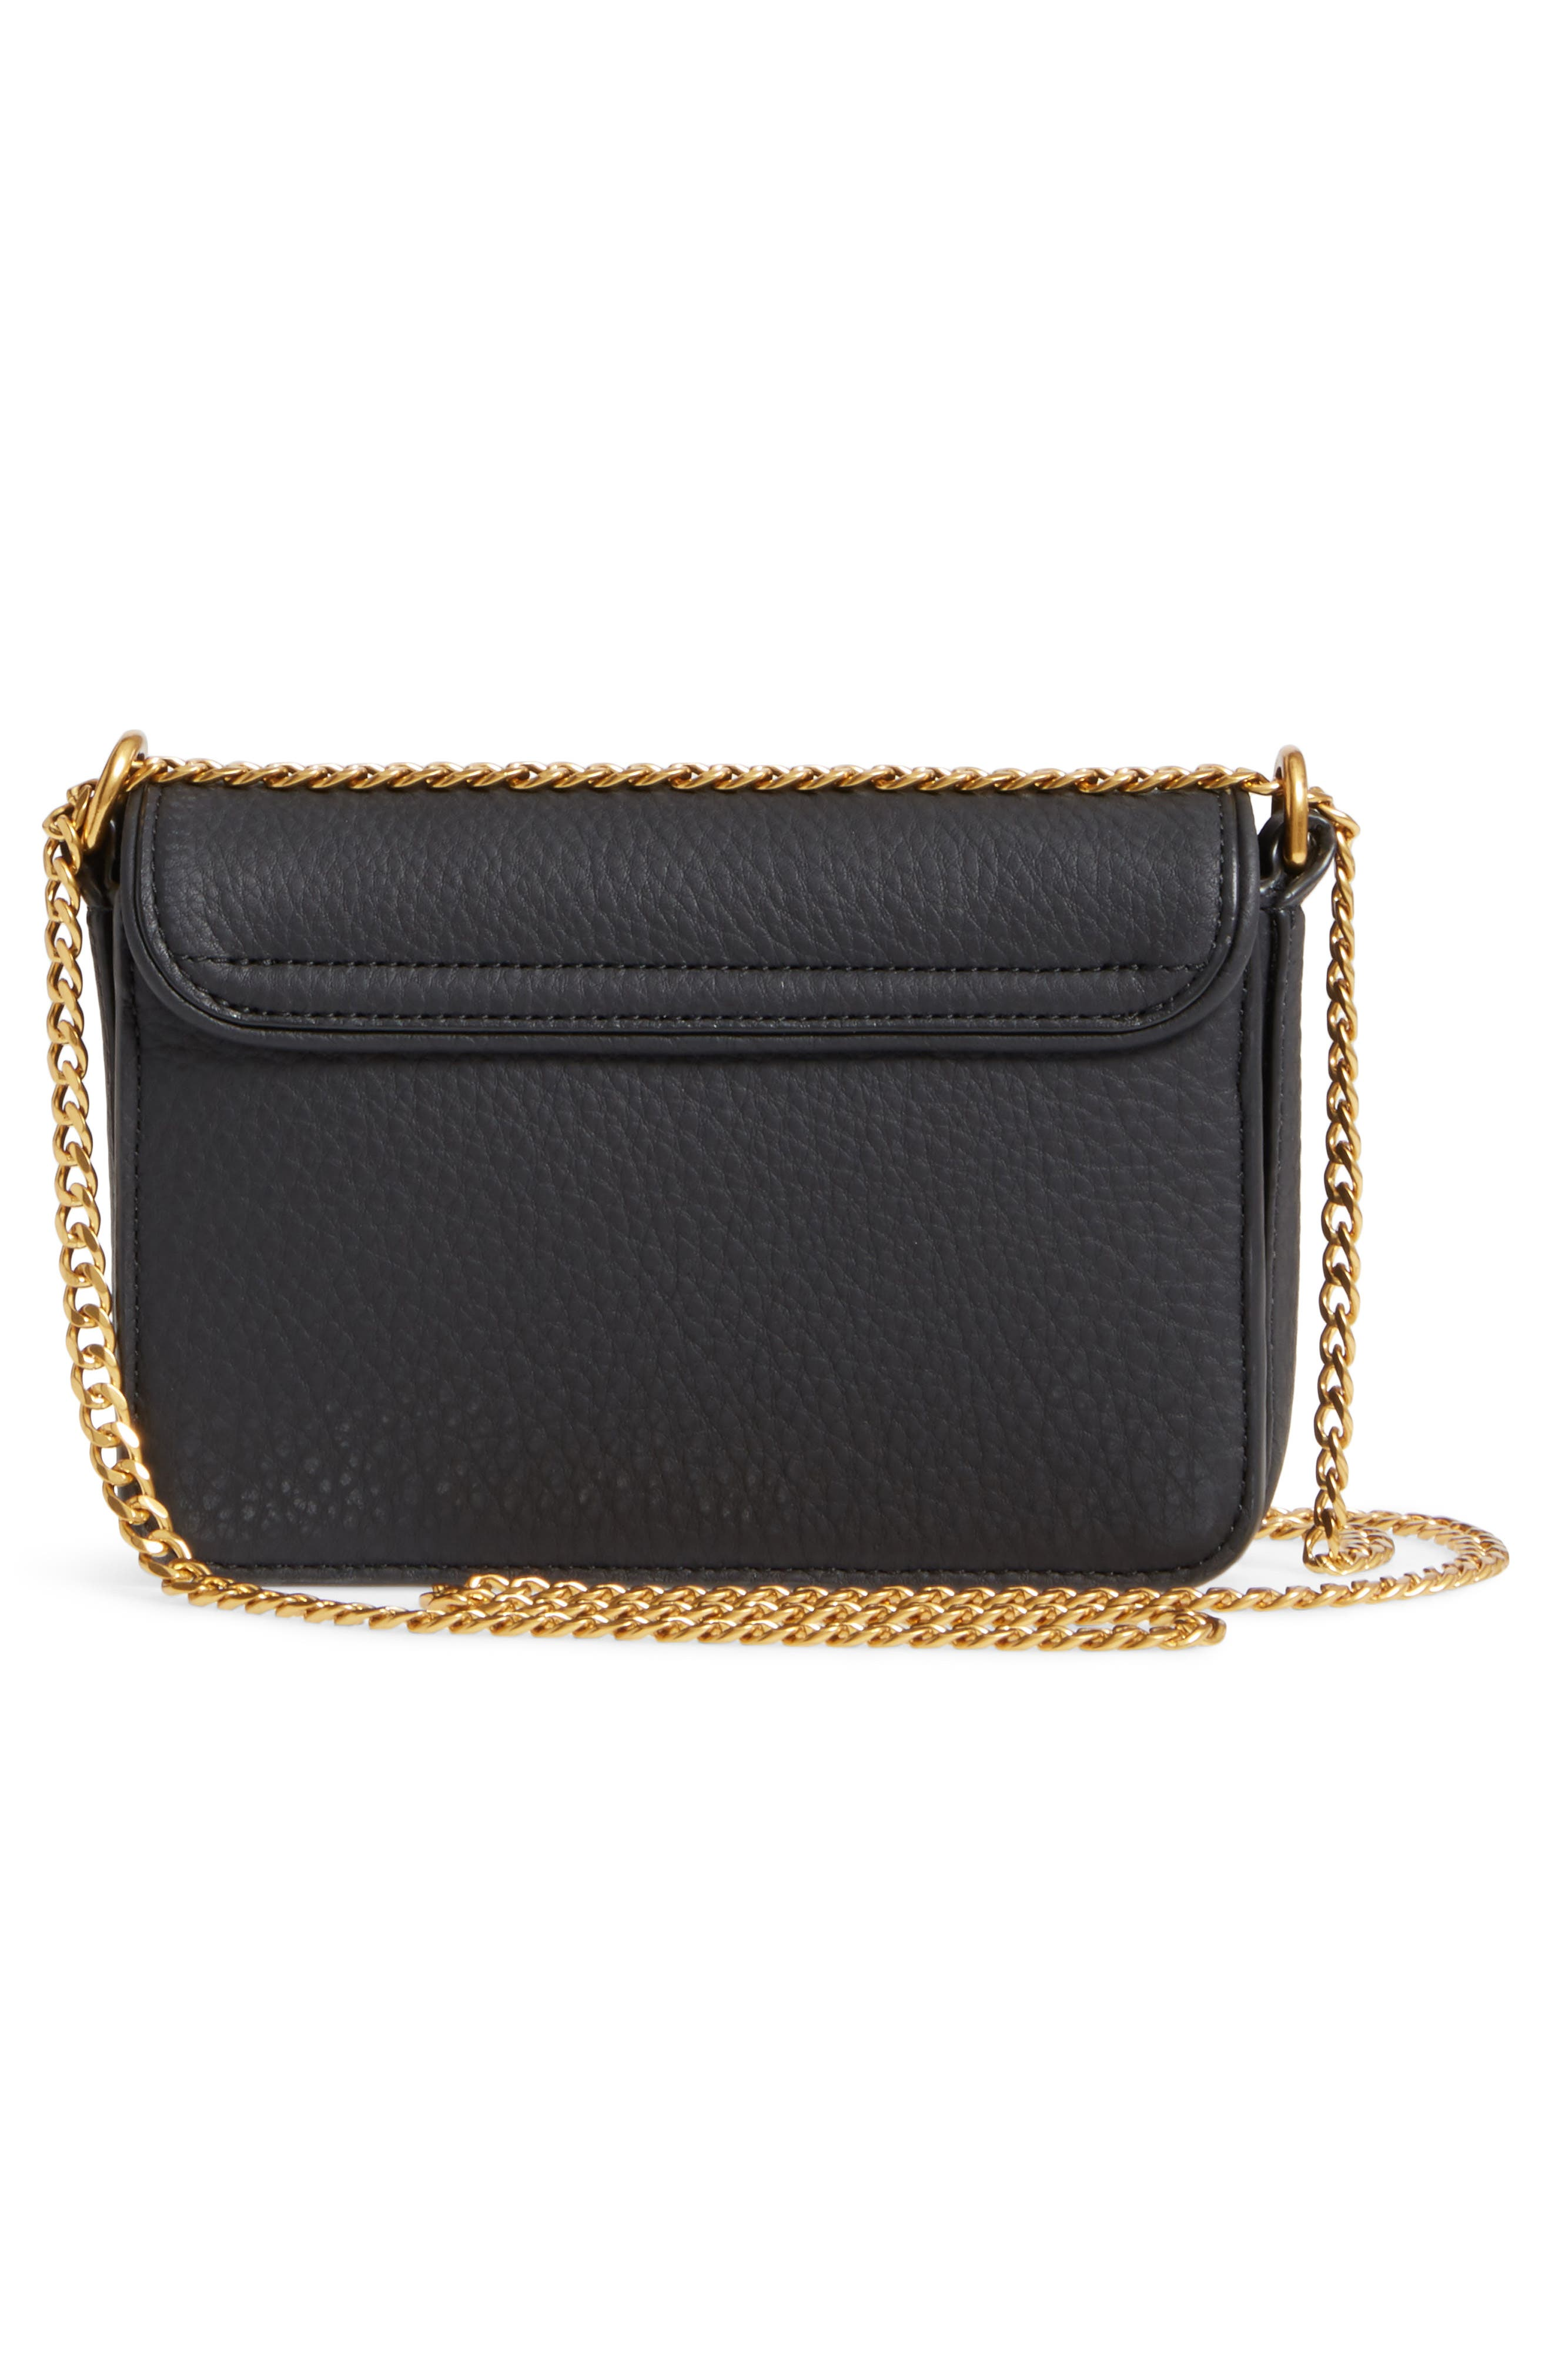 Mini Chelsea Leather Convertible Crossbody Bag,                             Alternate thumbnail 3, color,                             001